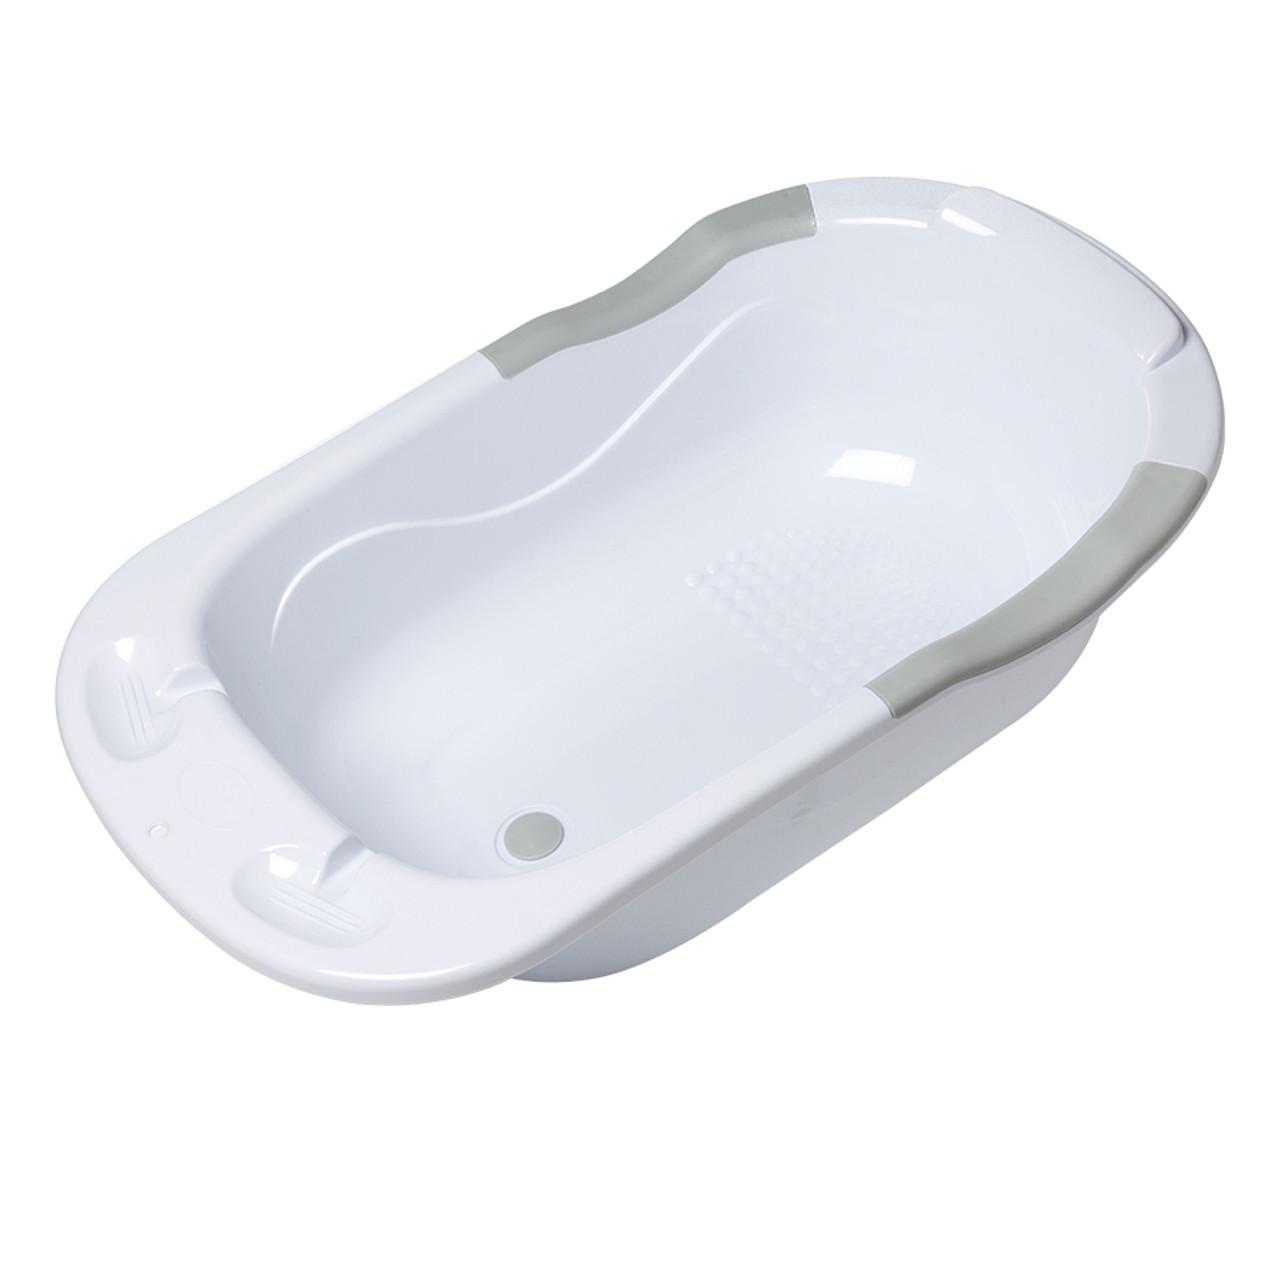 Big Softies White Plastic Baby Bath